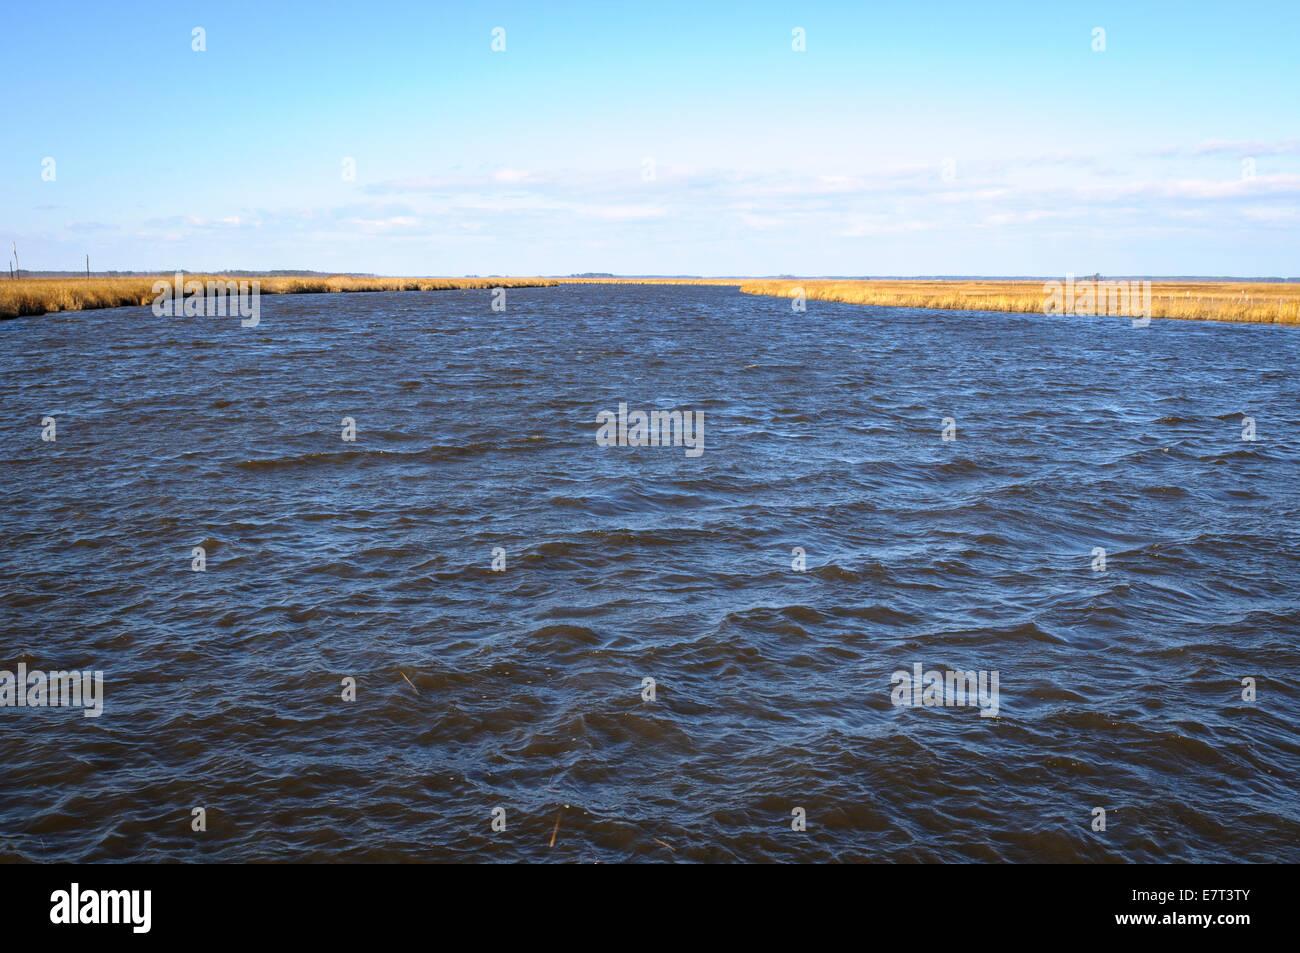 Blackwater River, Cambridge, Maryland - Stock Image